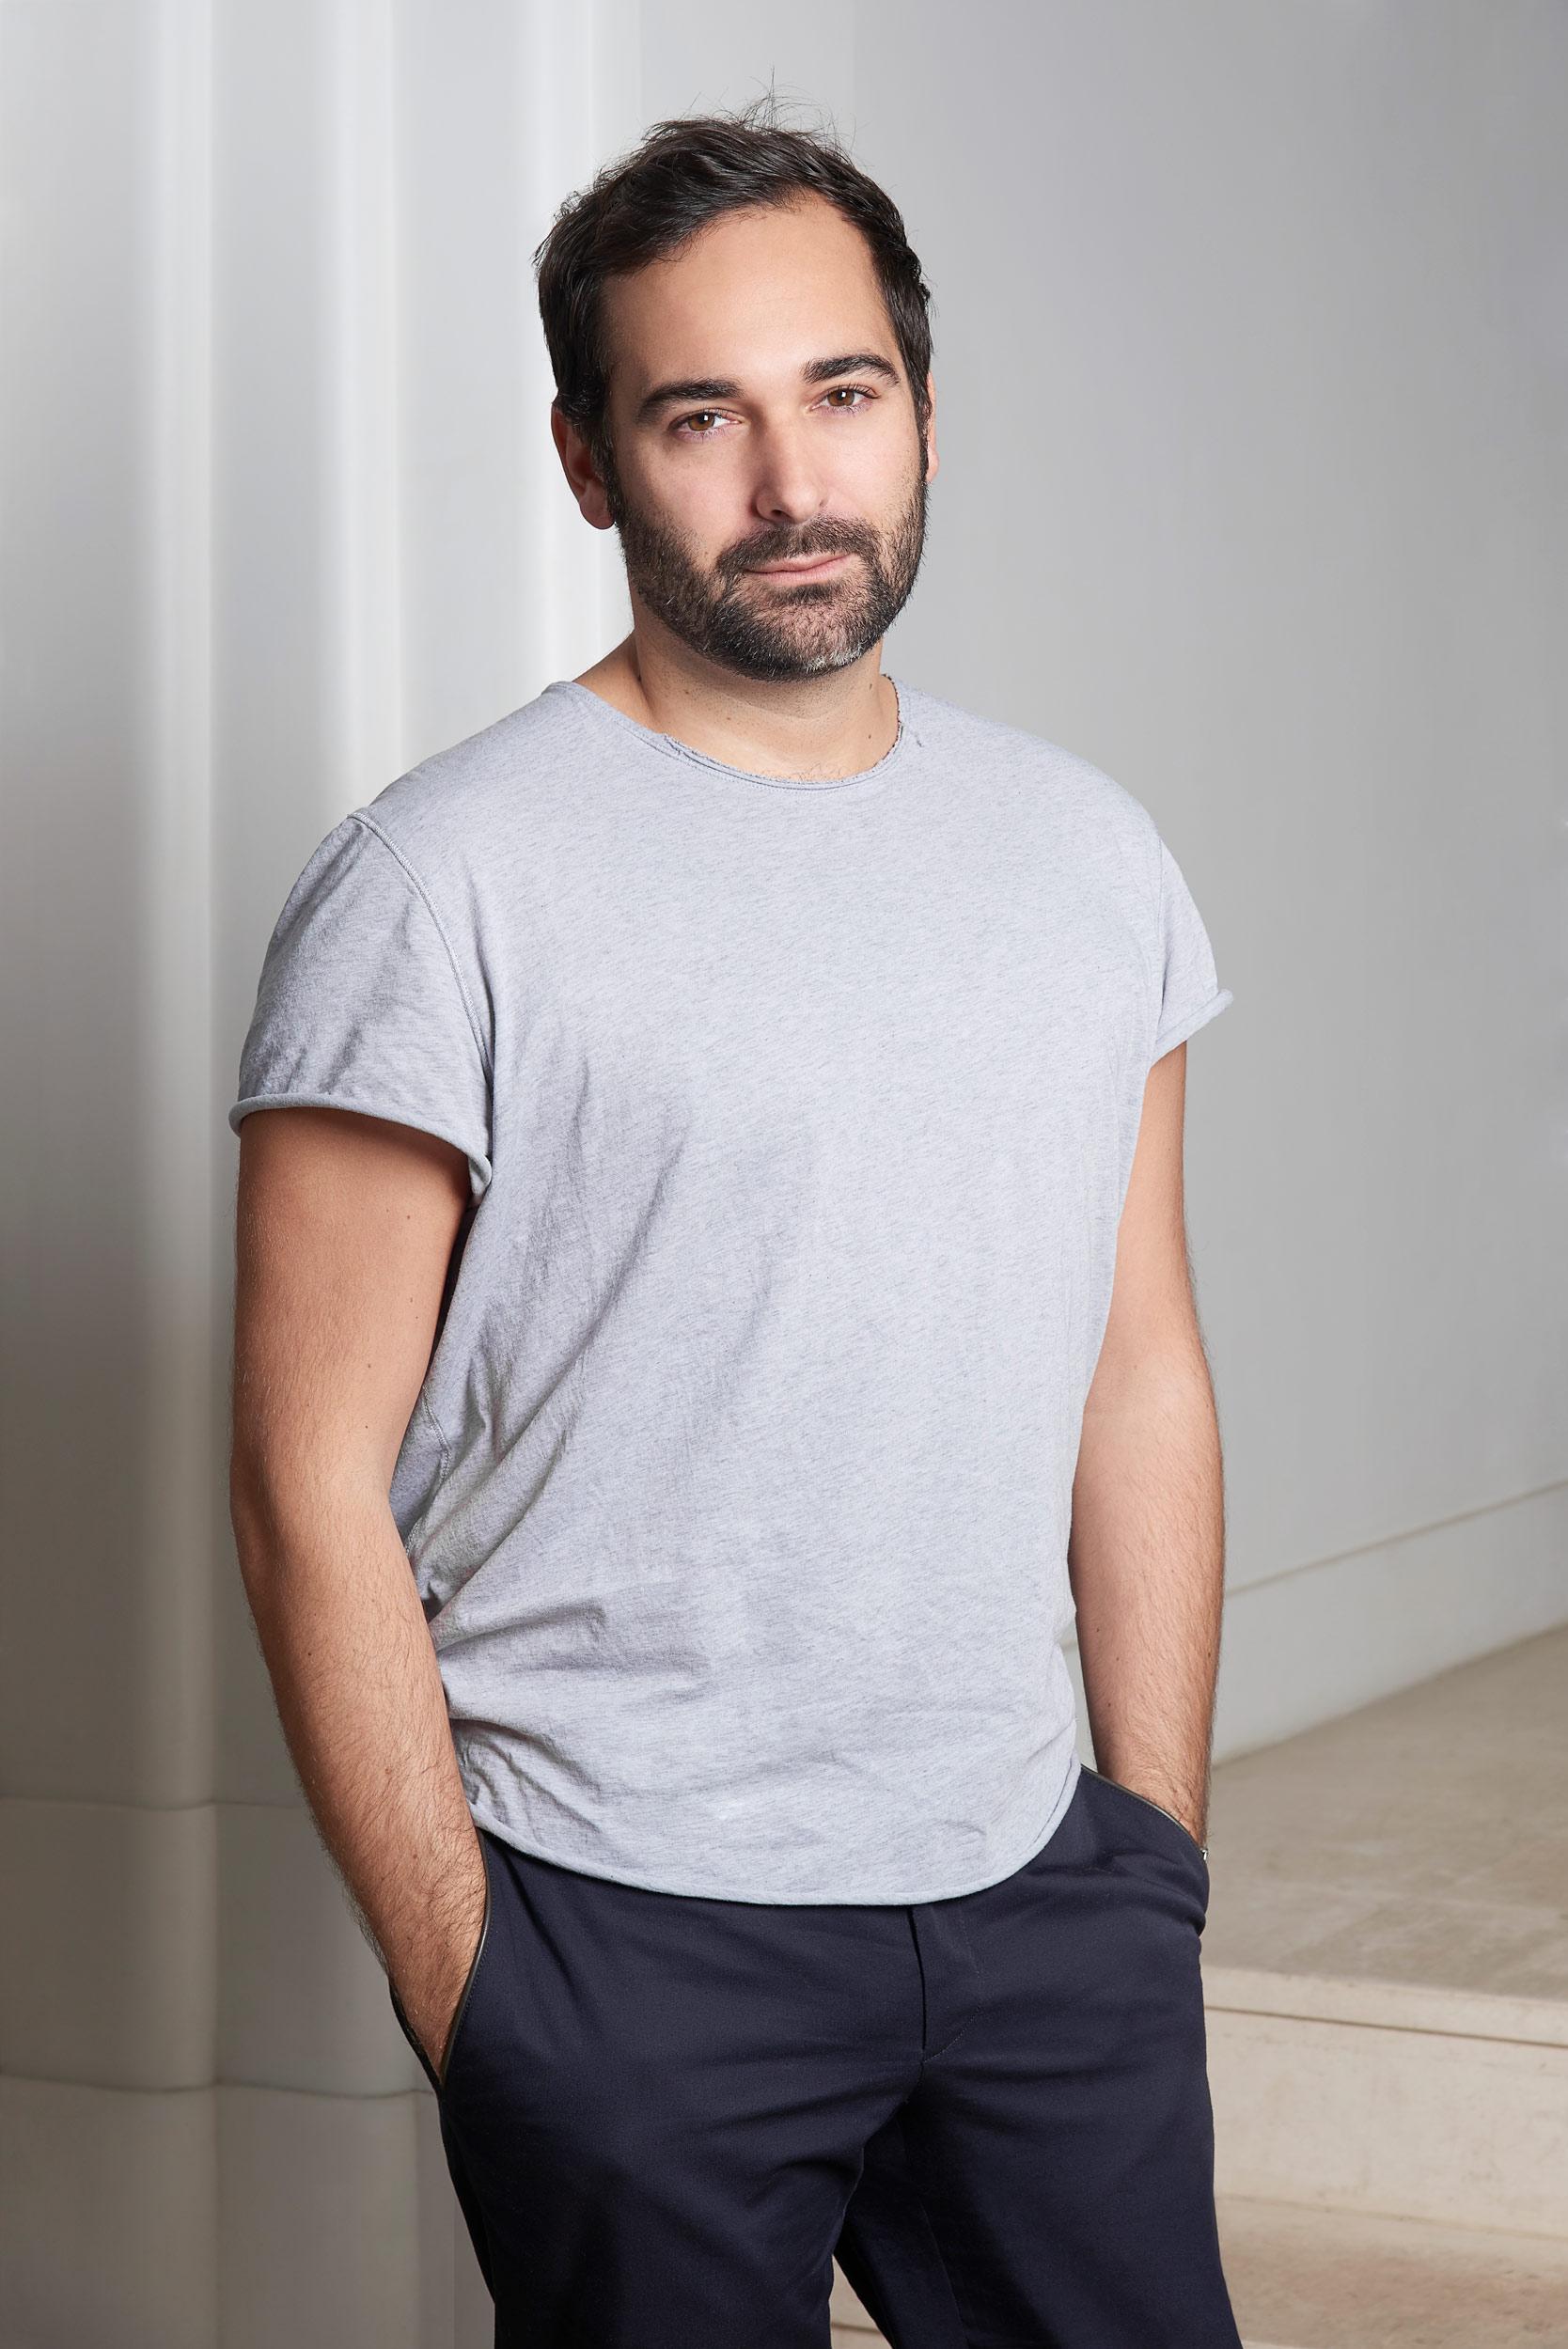 Rodolphe Parente